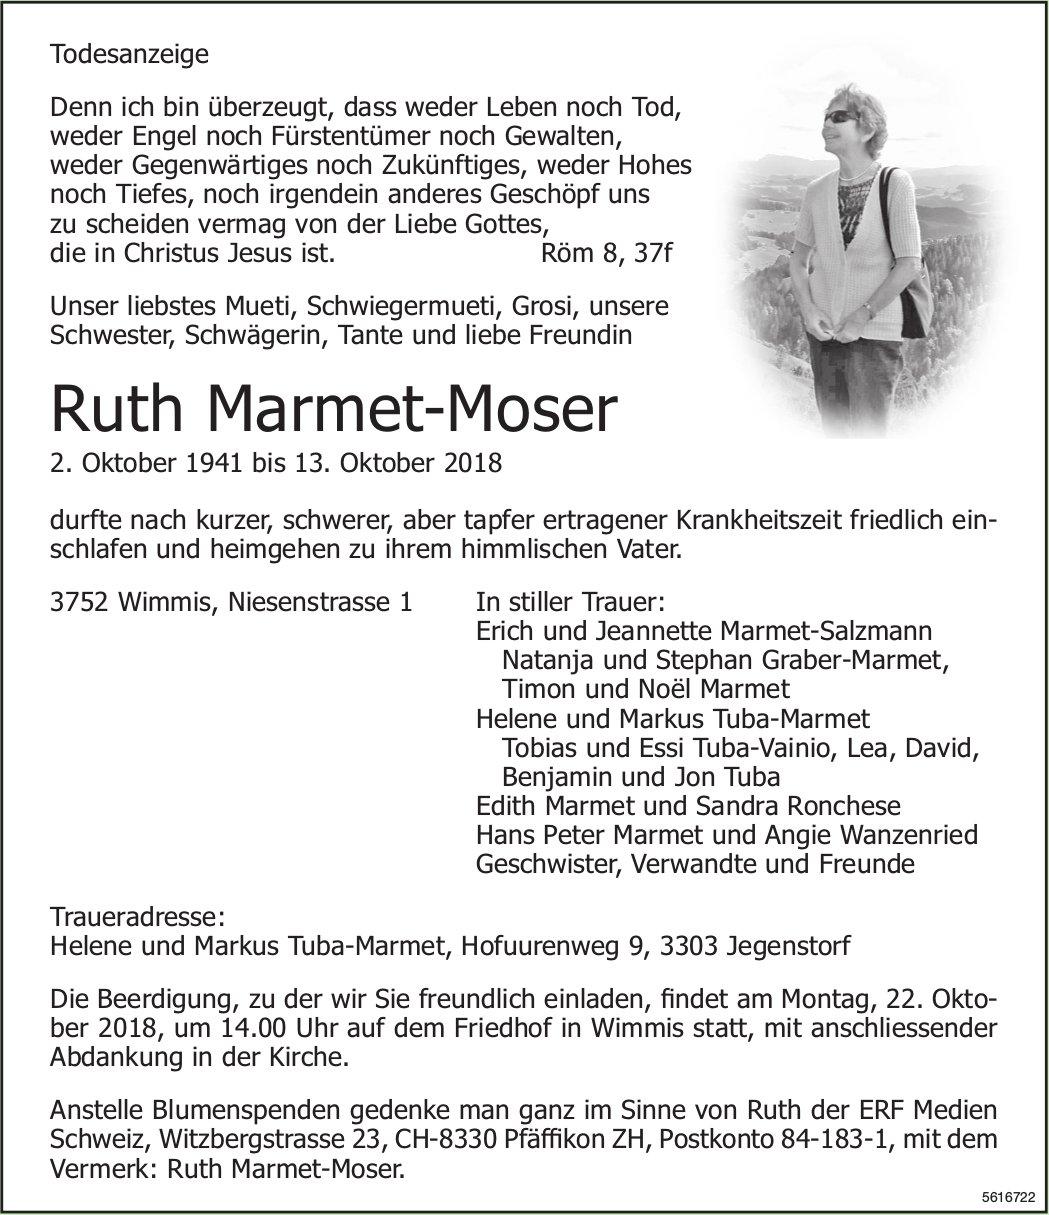 Marmet-Moser Ruth, Oktober 2018 / TA